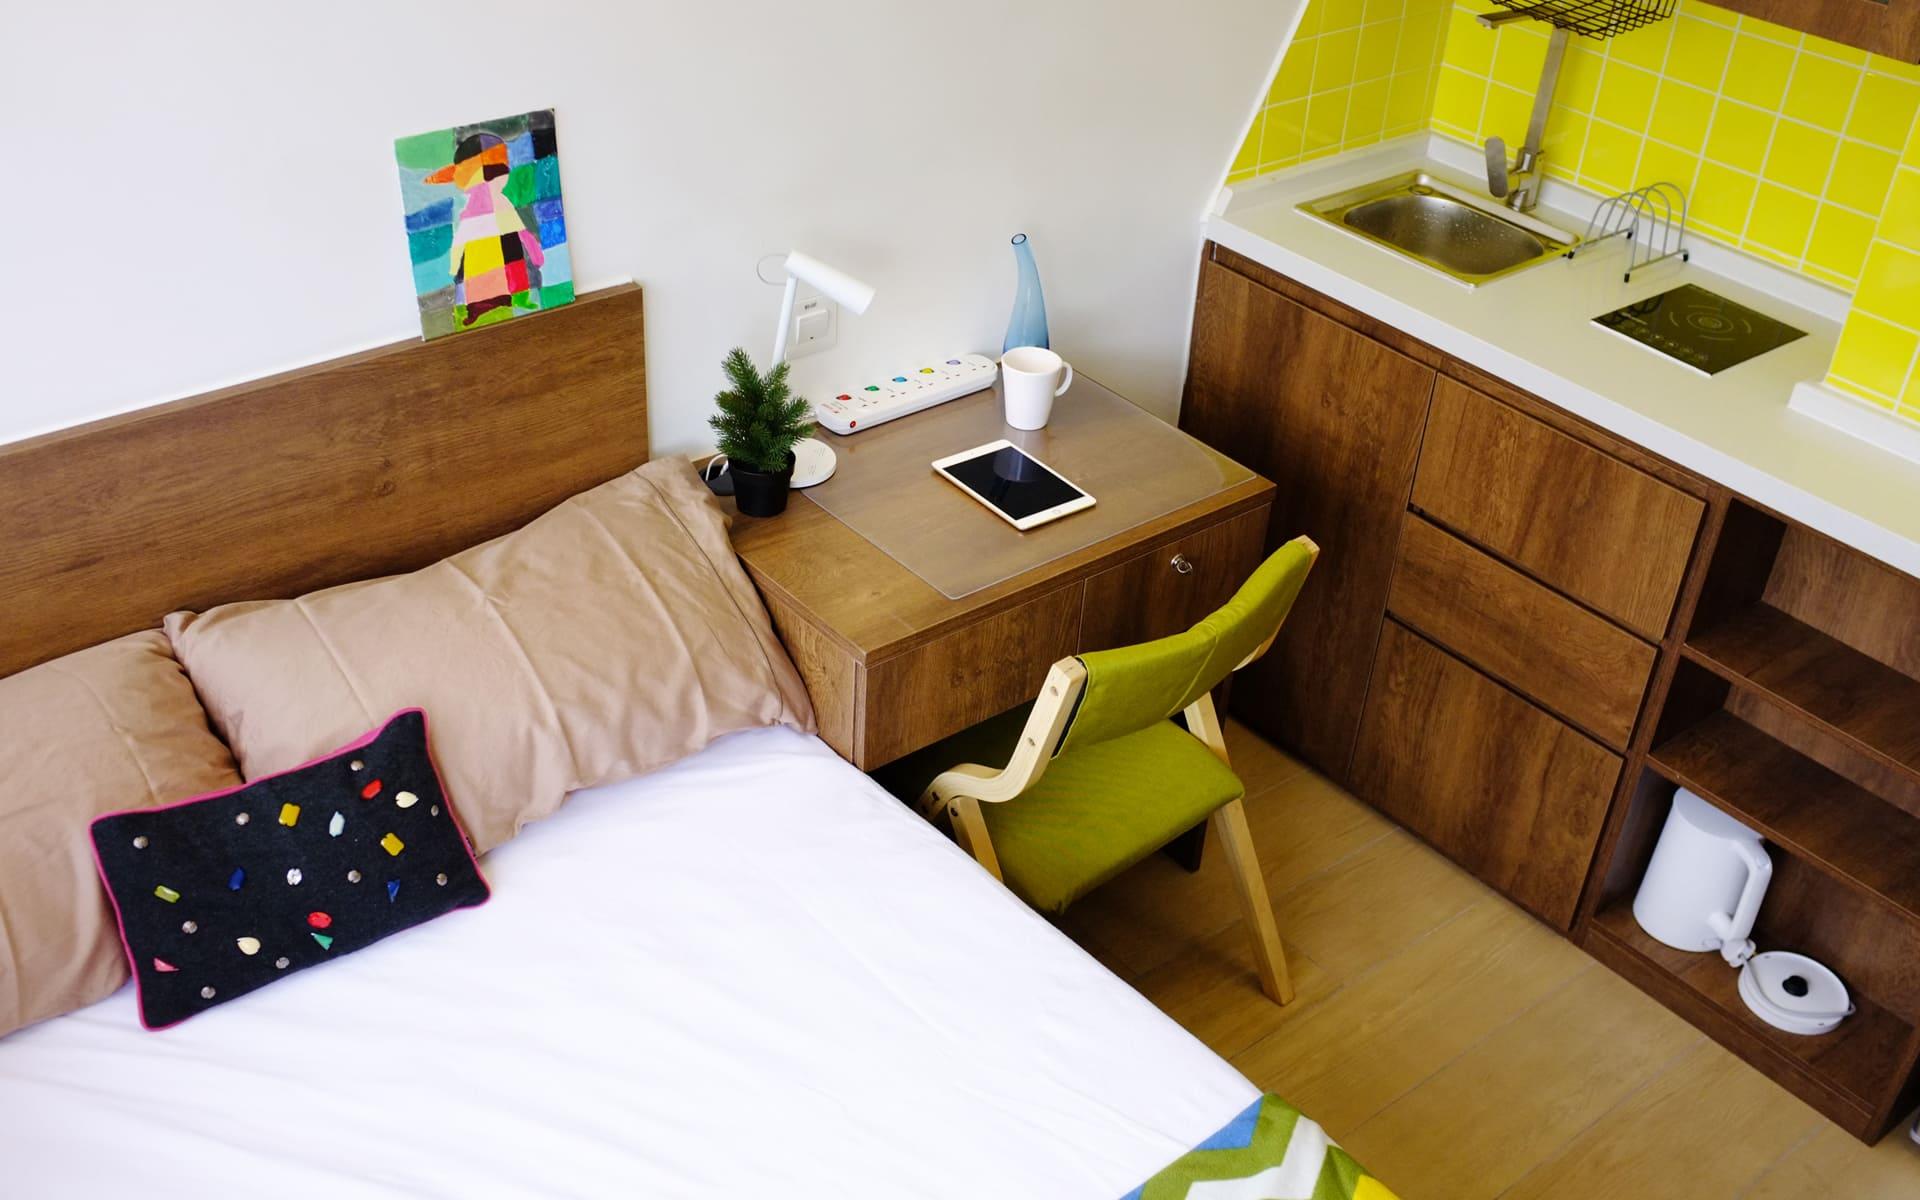 hk_service_apartment_10409375351596695763.jpg